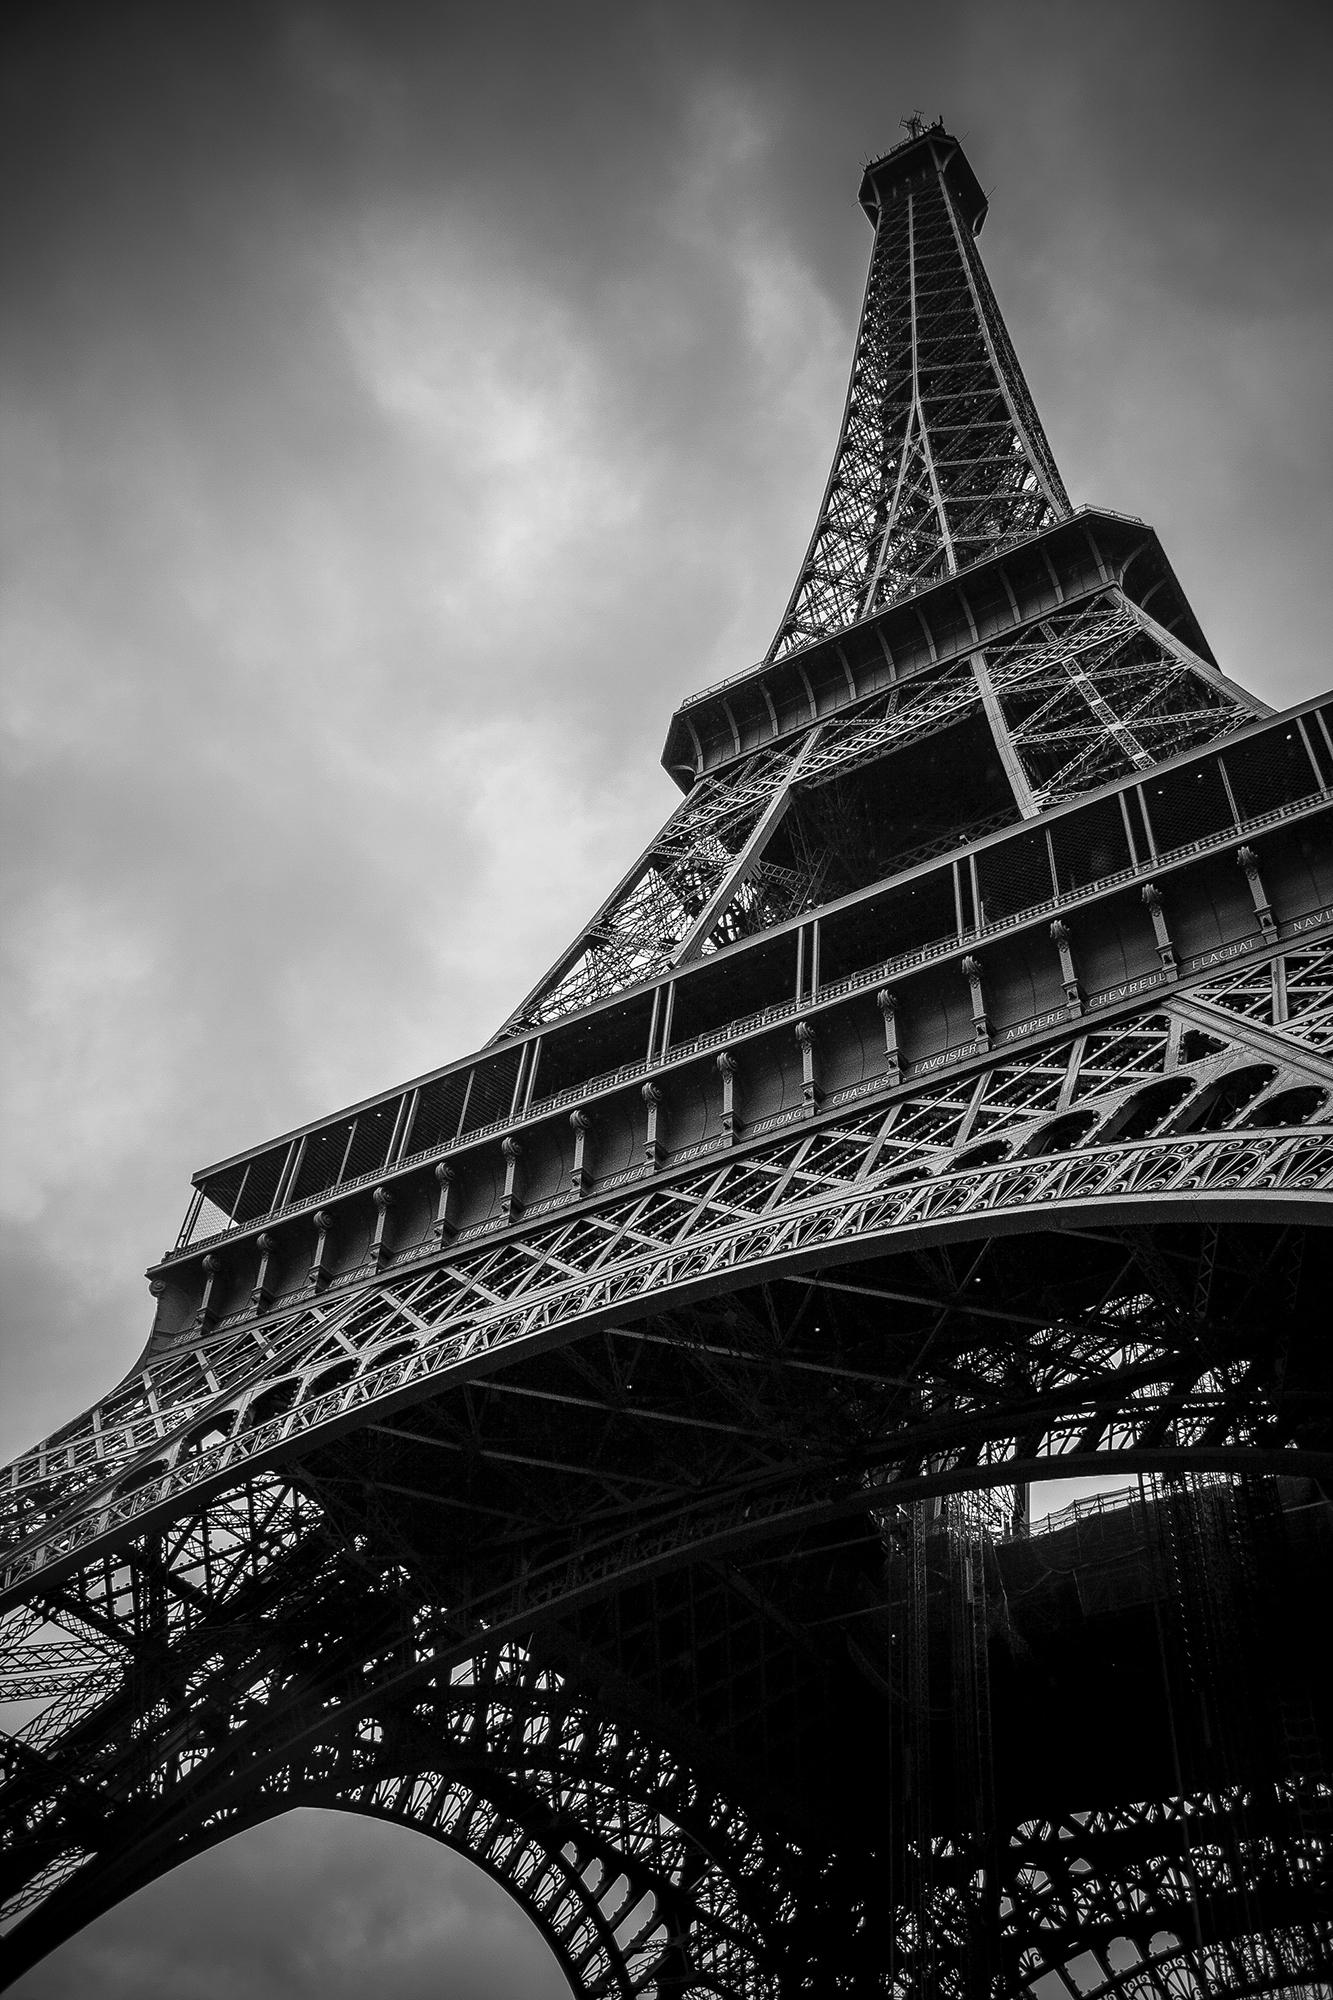 Details About Eiffel Tower Paris France Black White Art Print Wall Decor Image Unframed Poster